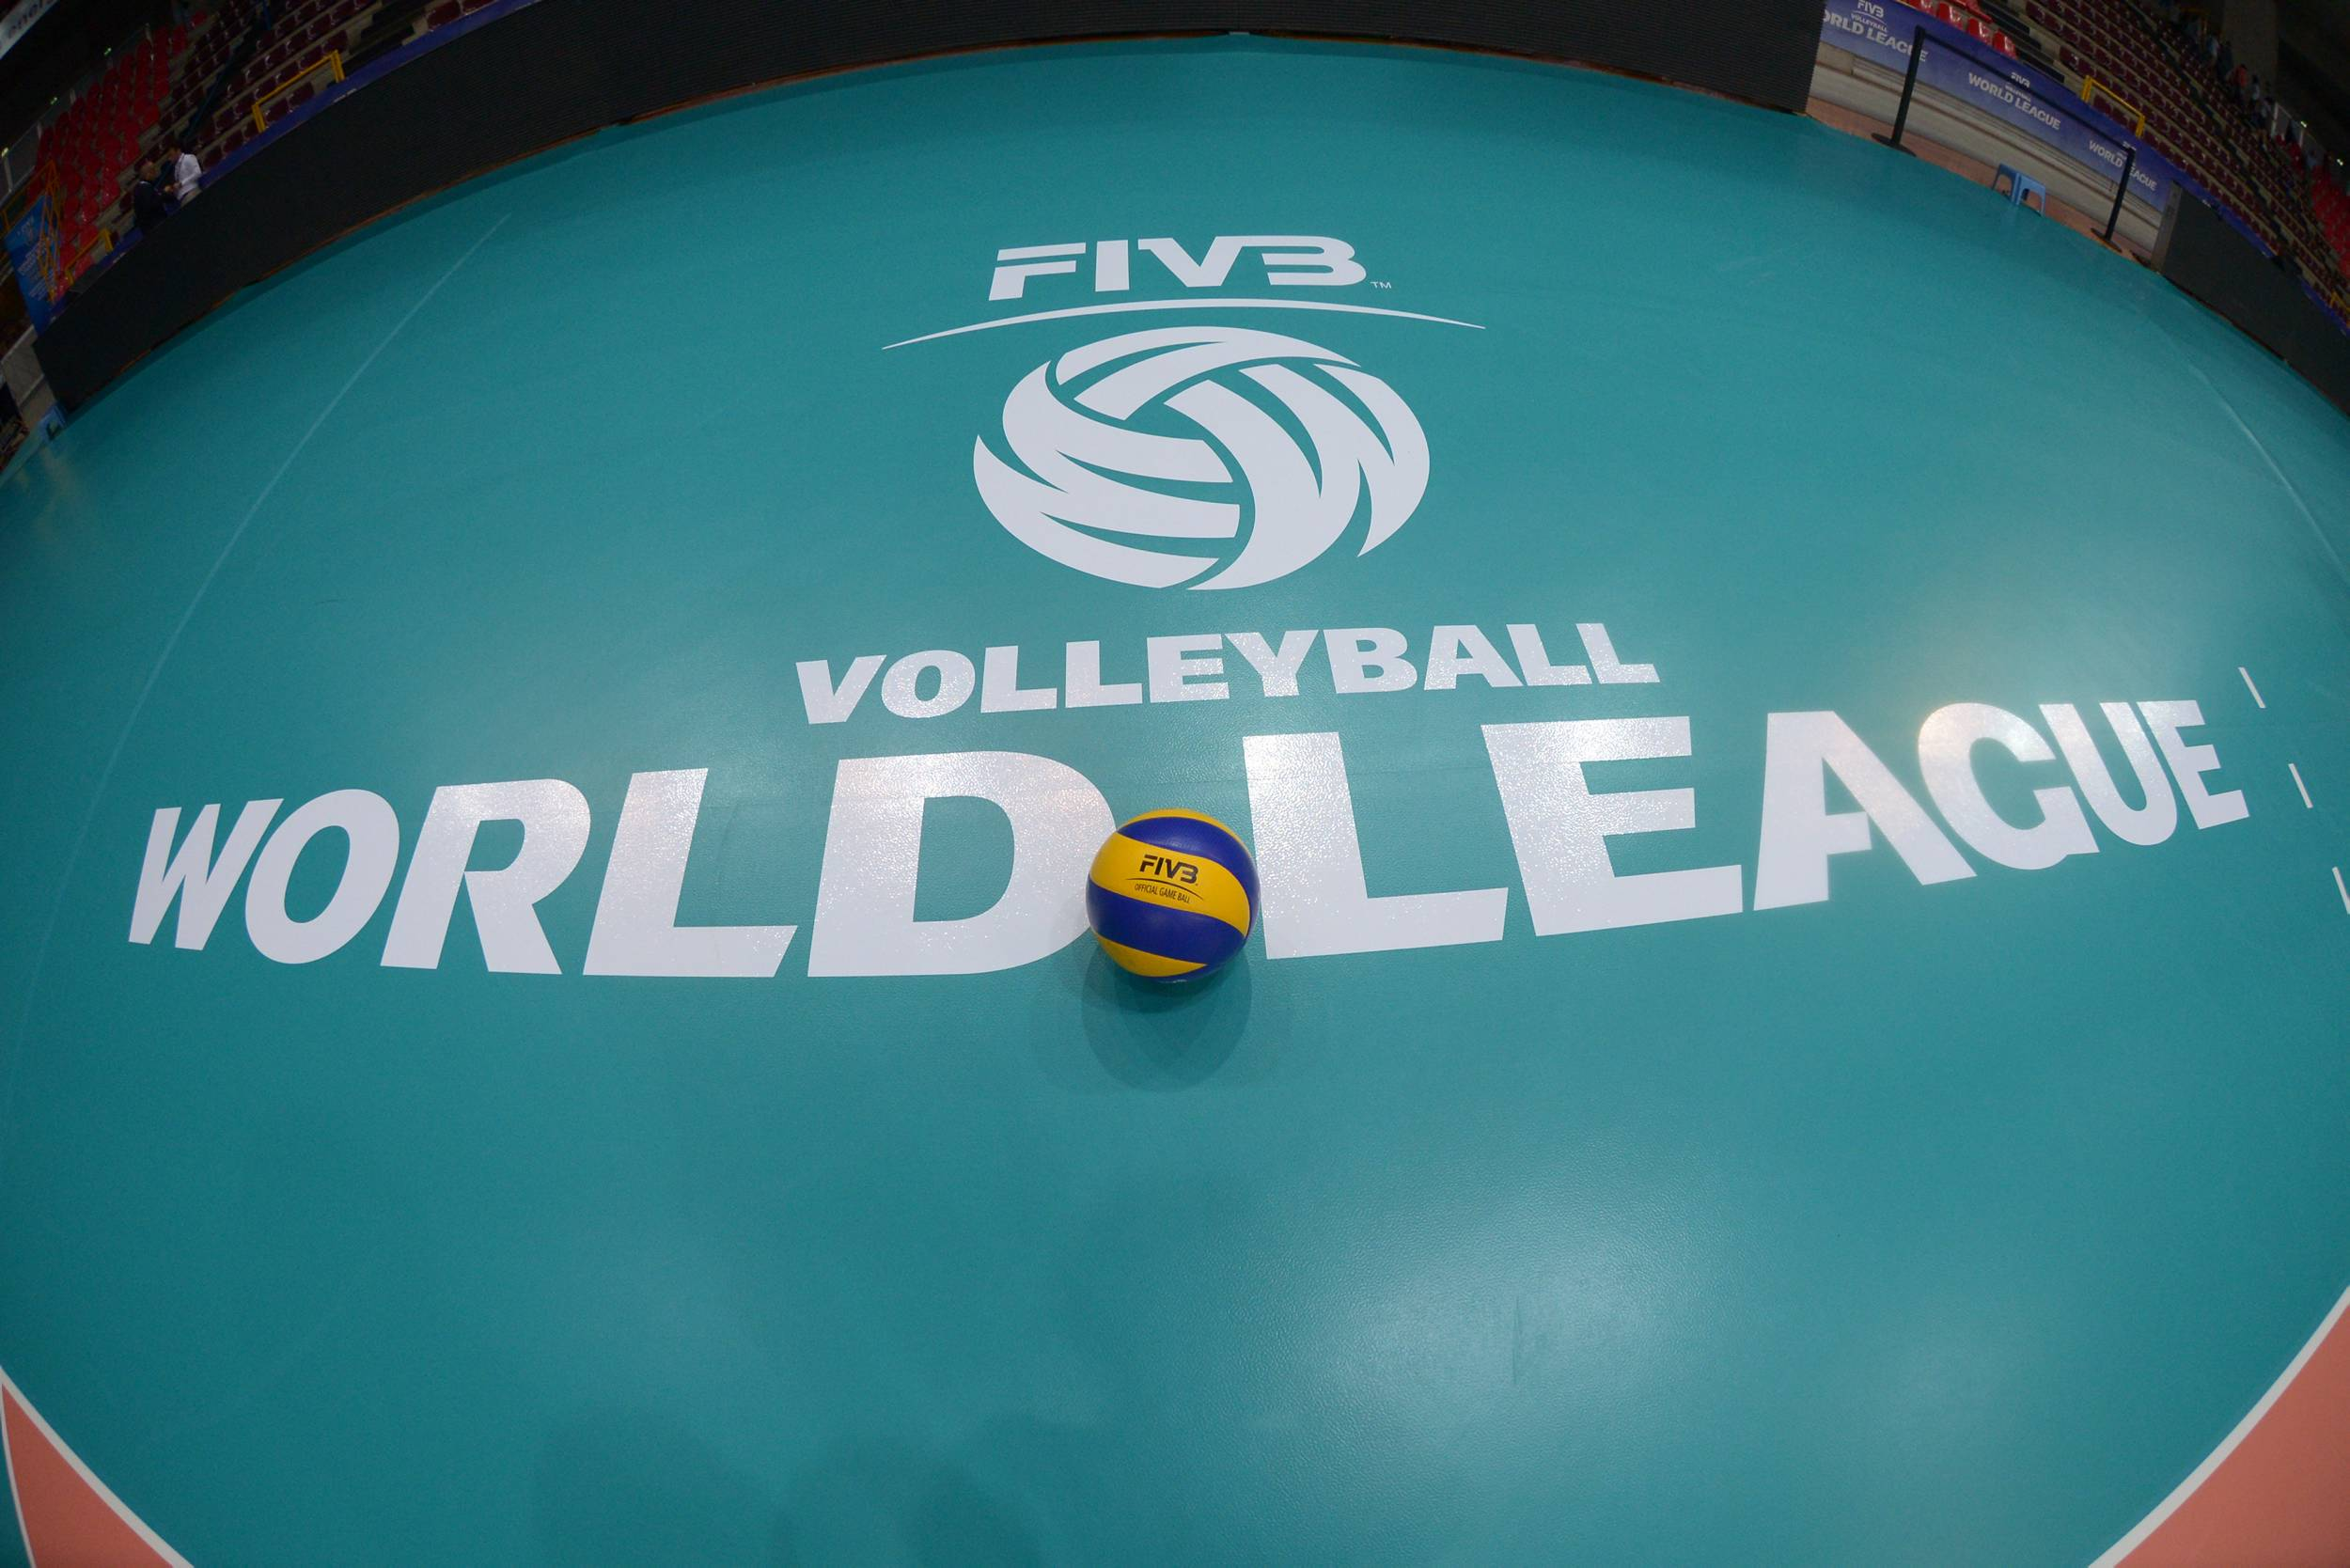 Fivb World League 2014